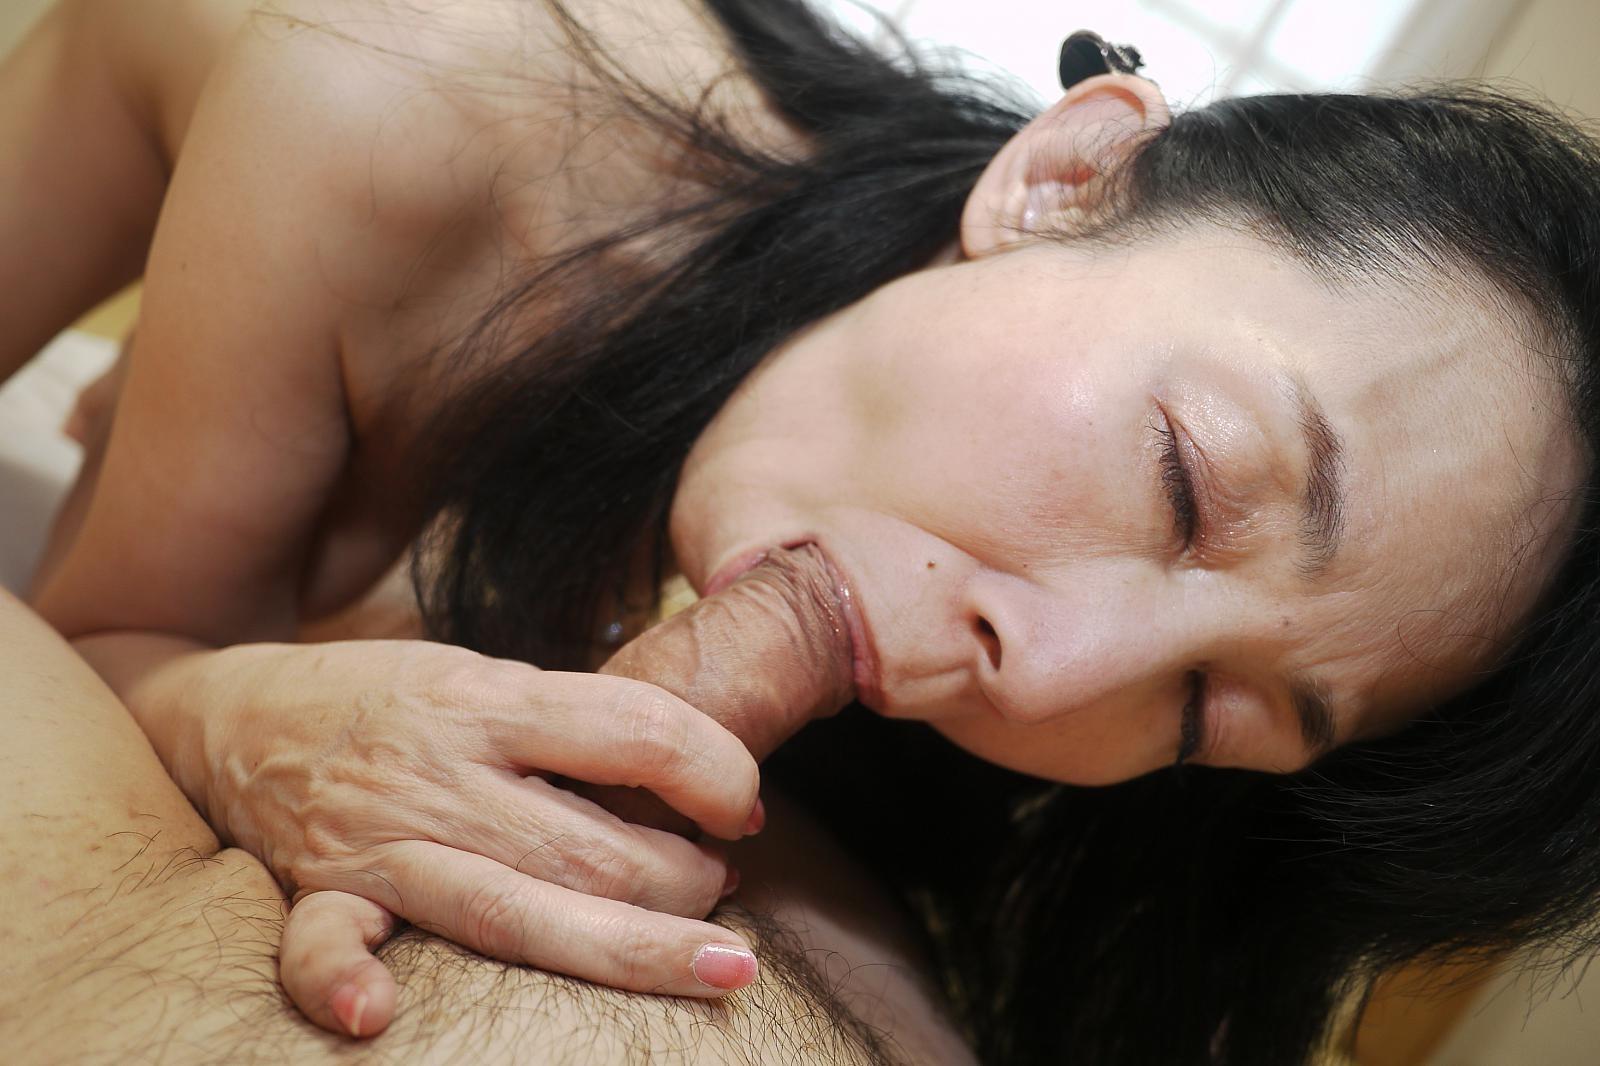 Groups blow jobs asian women — photo 6